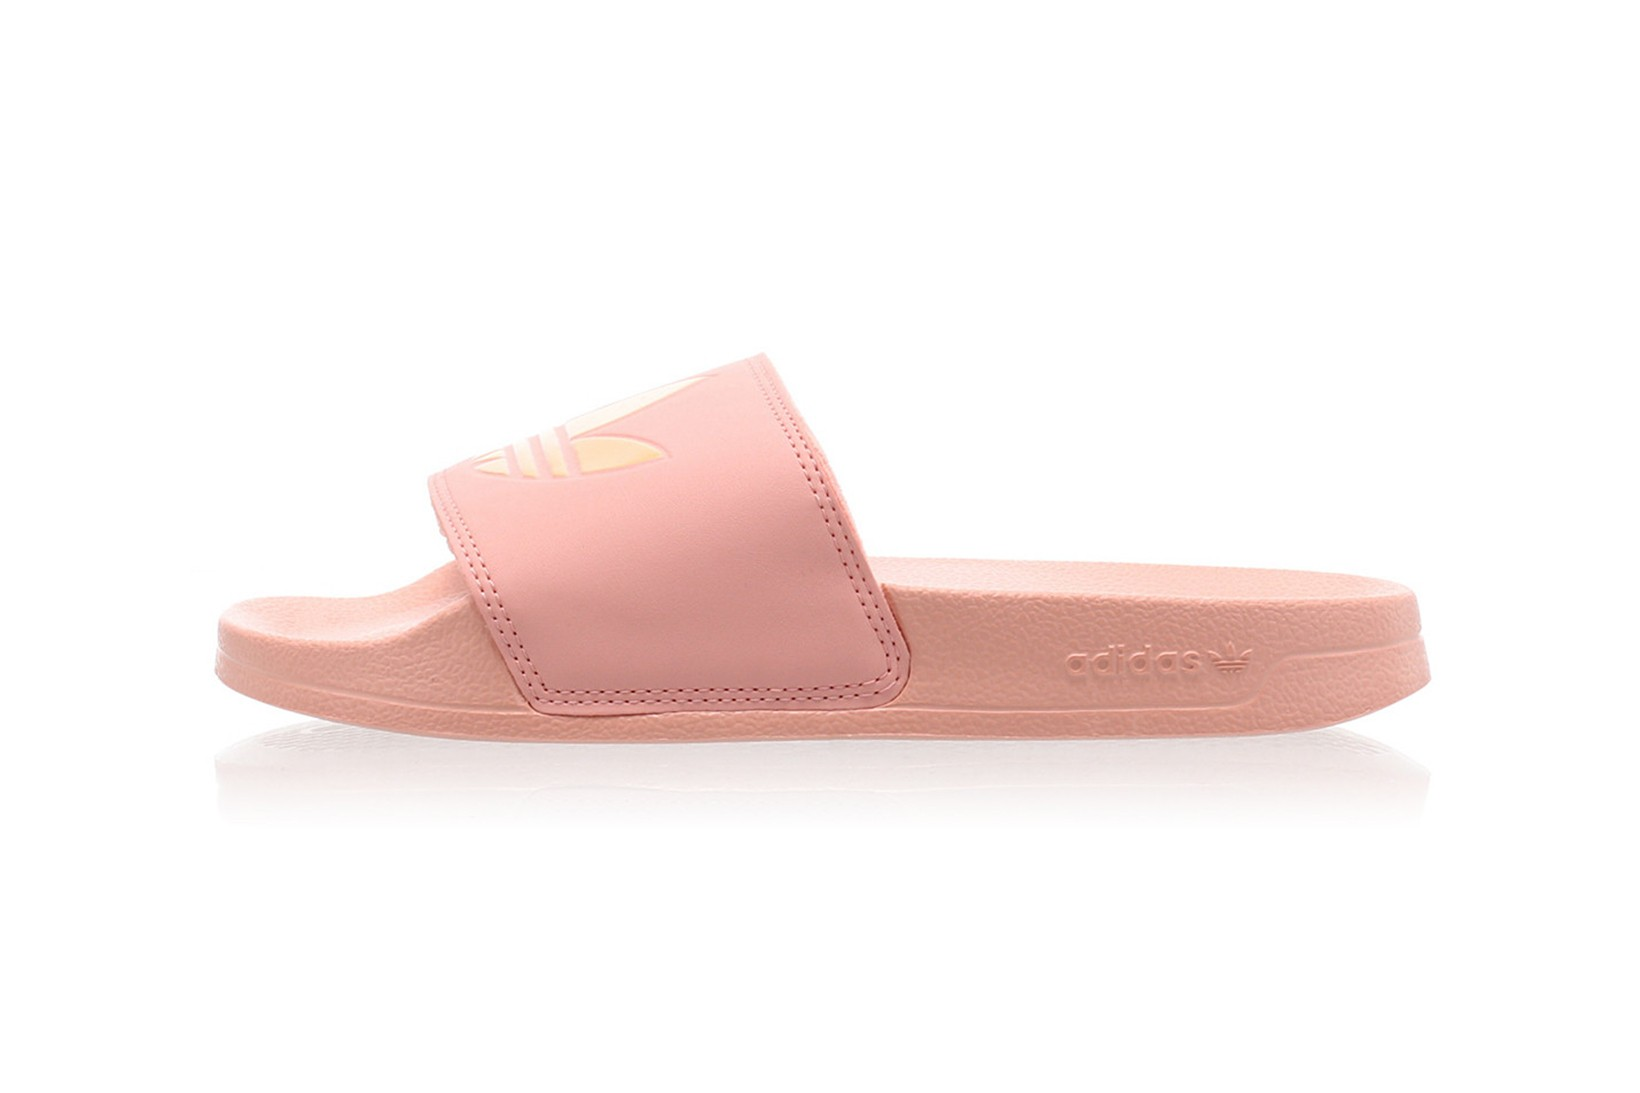 adidas slippers white